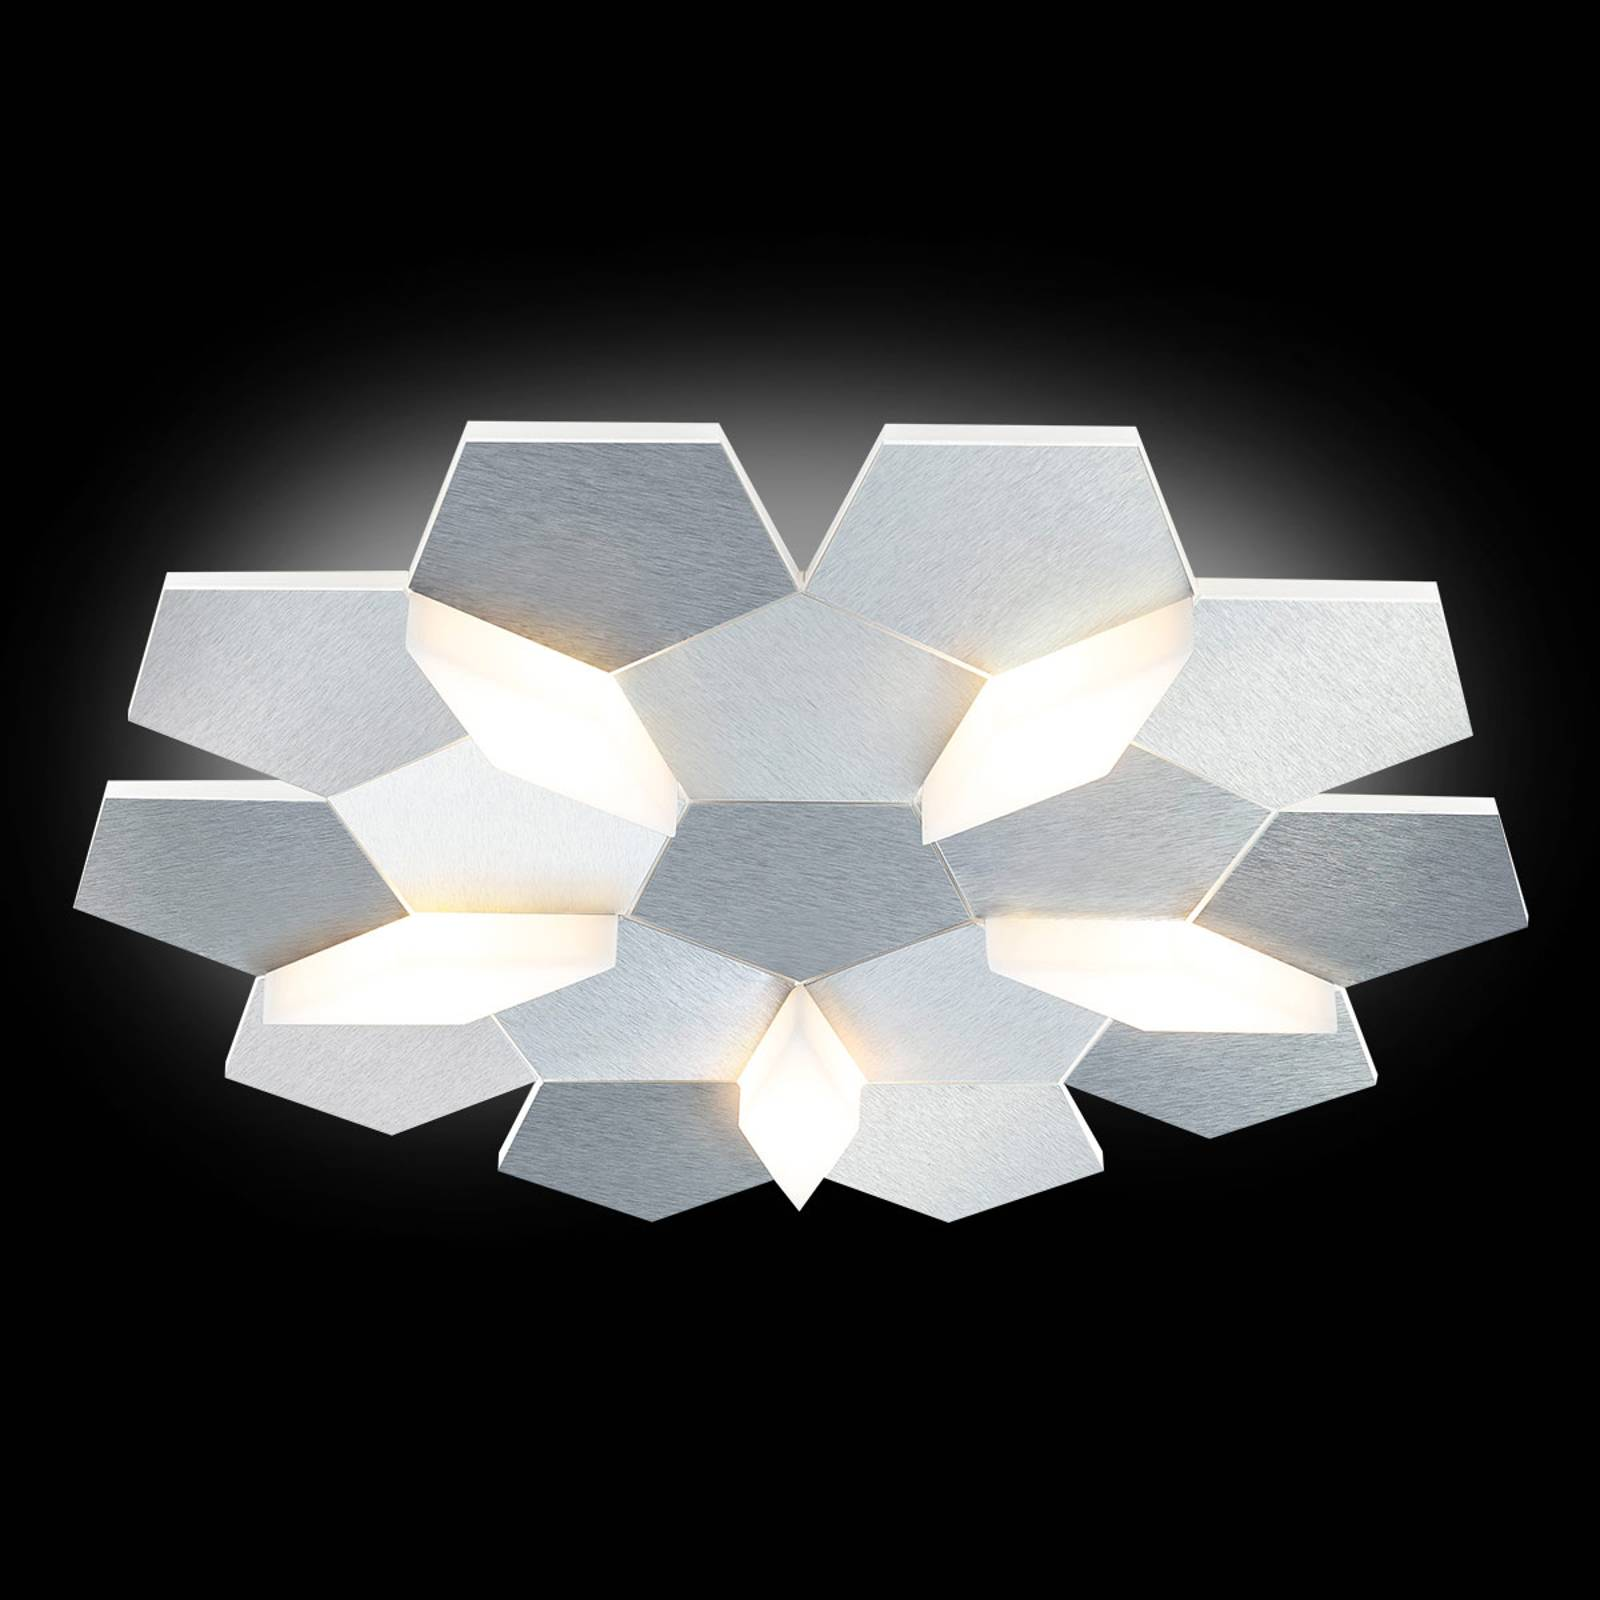 GROSSMANN Karat LED-Deckenleuchte, 5flammig